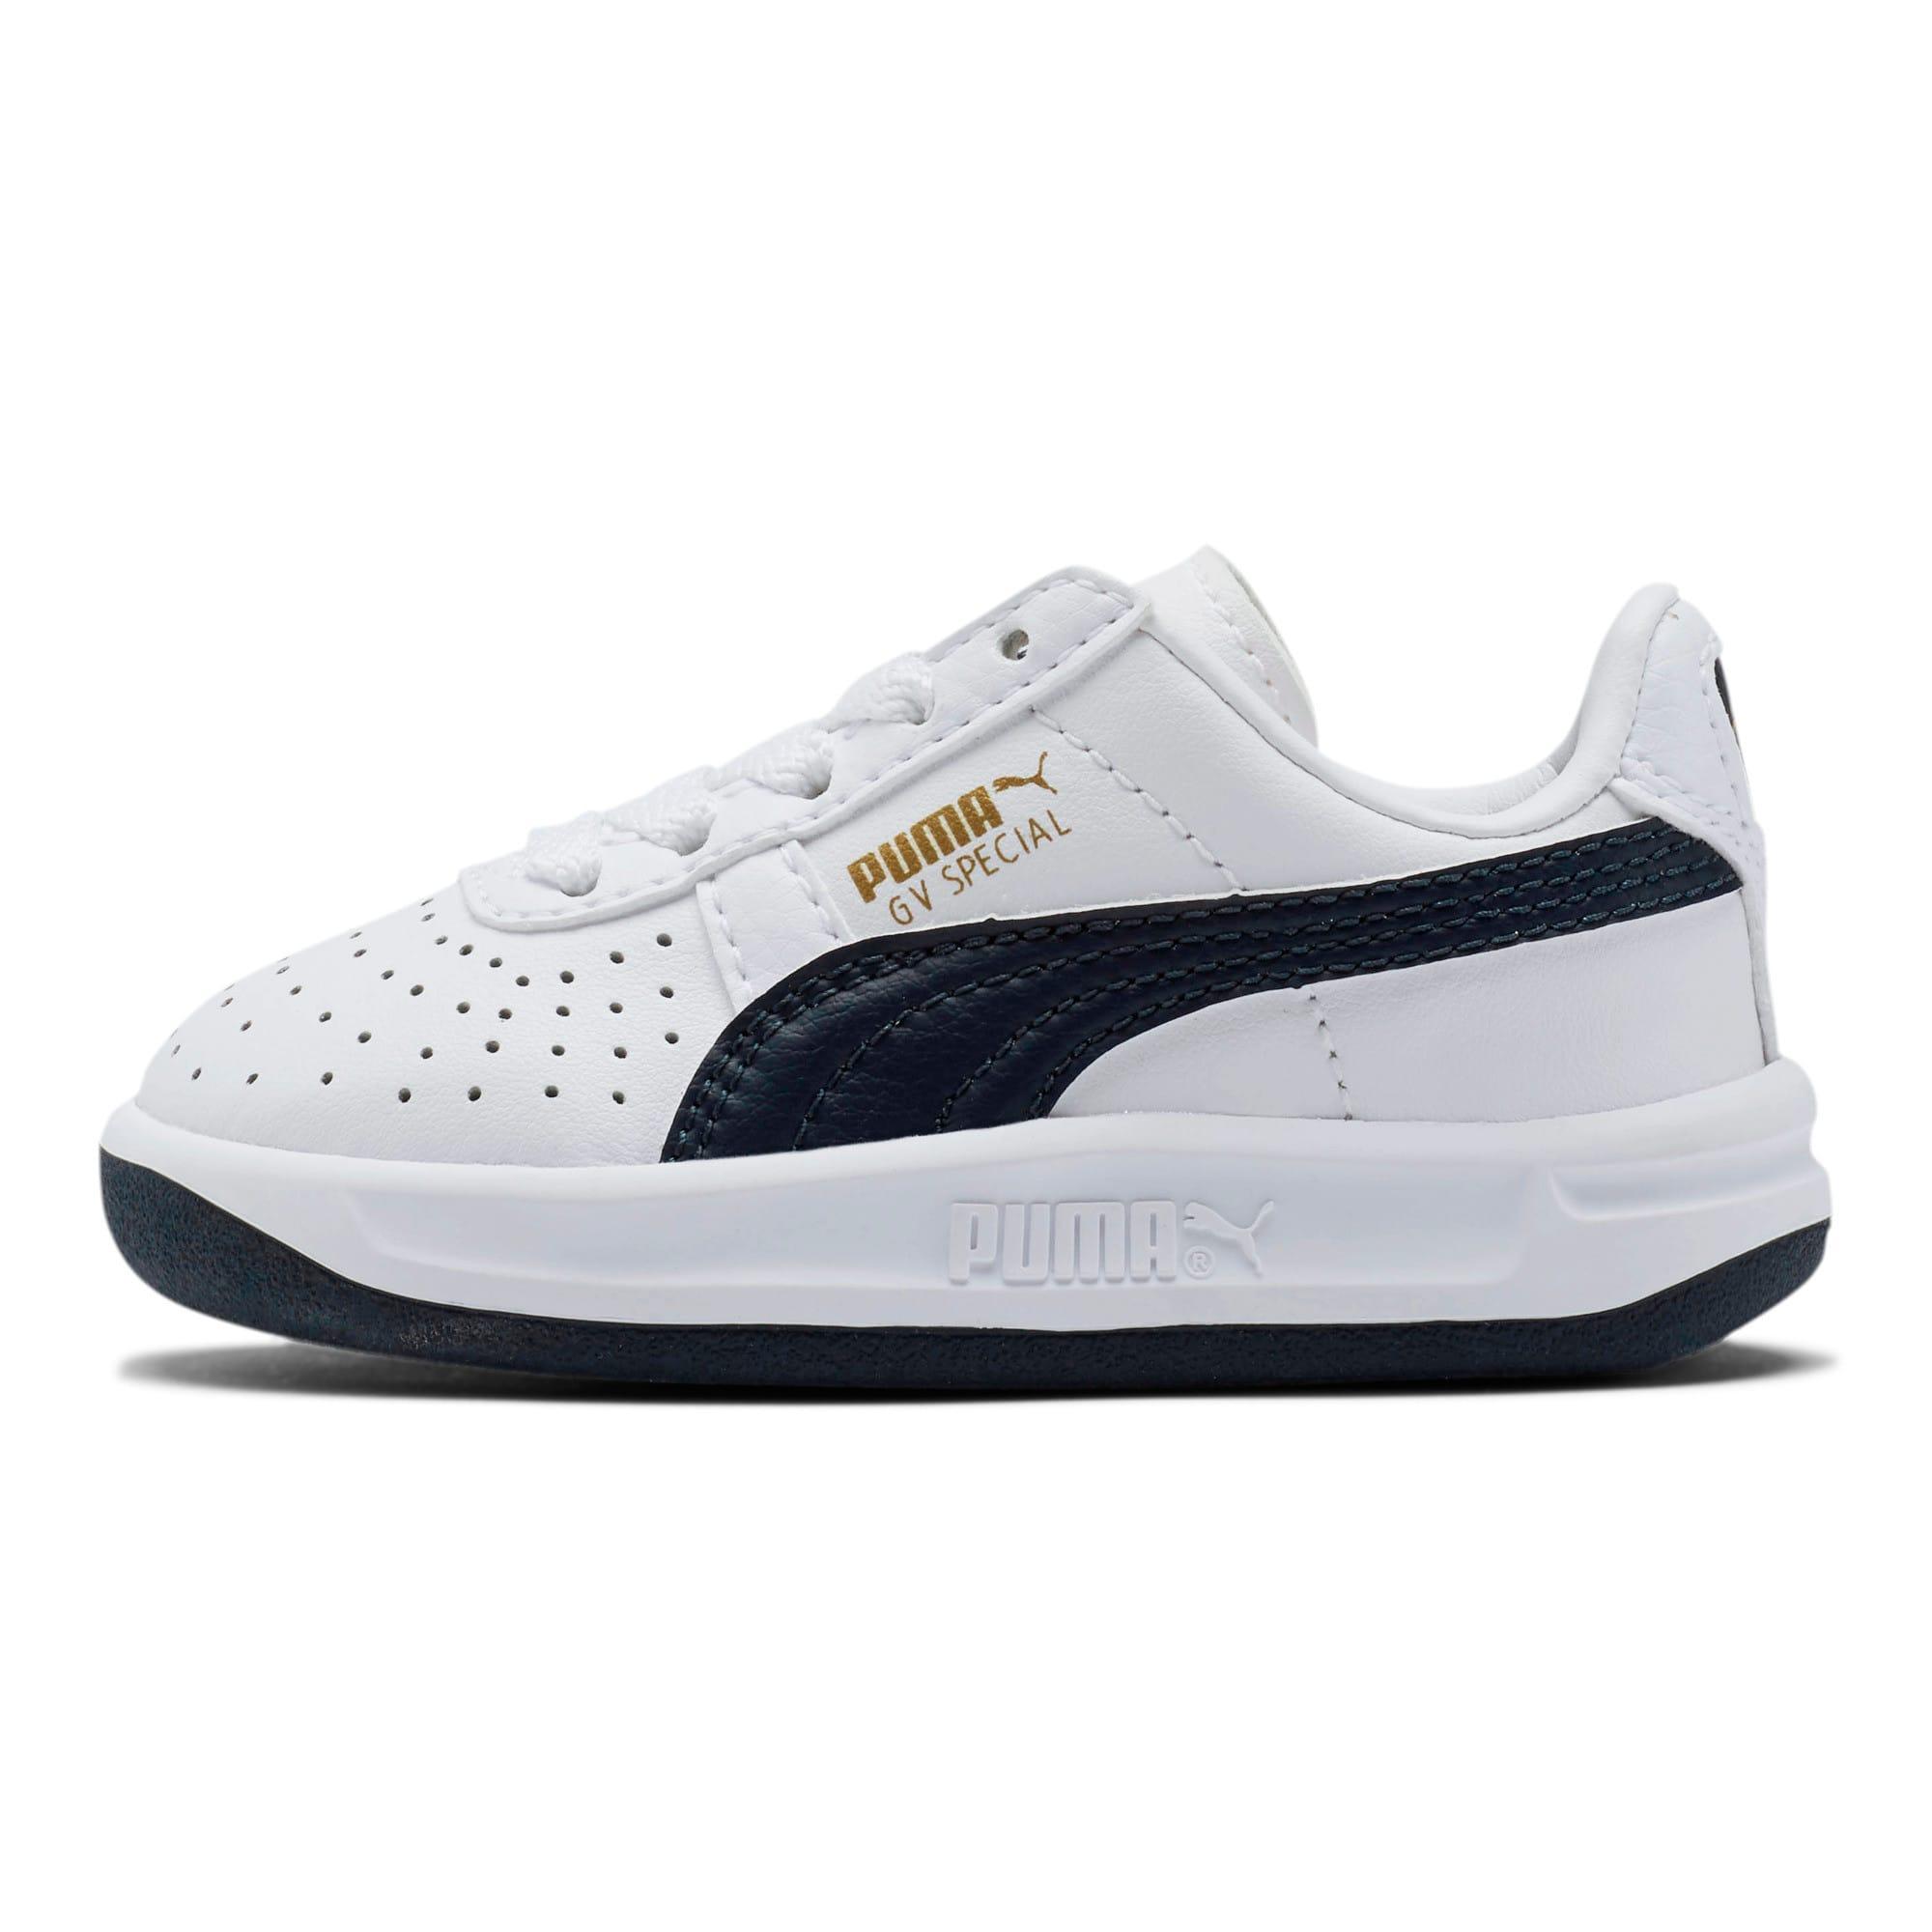 Thumbnail 1 of GV Special Toddler Shoes, Puma White-Peacoat, medium